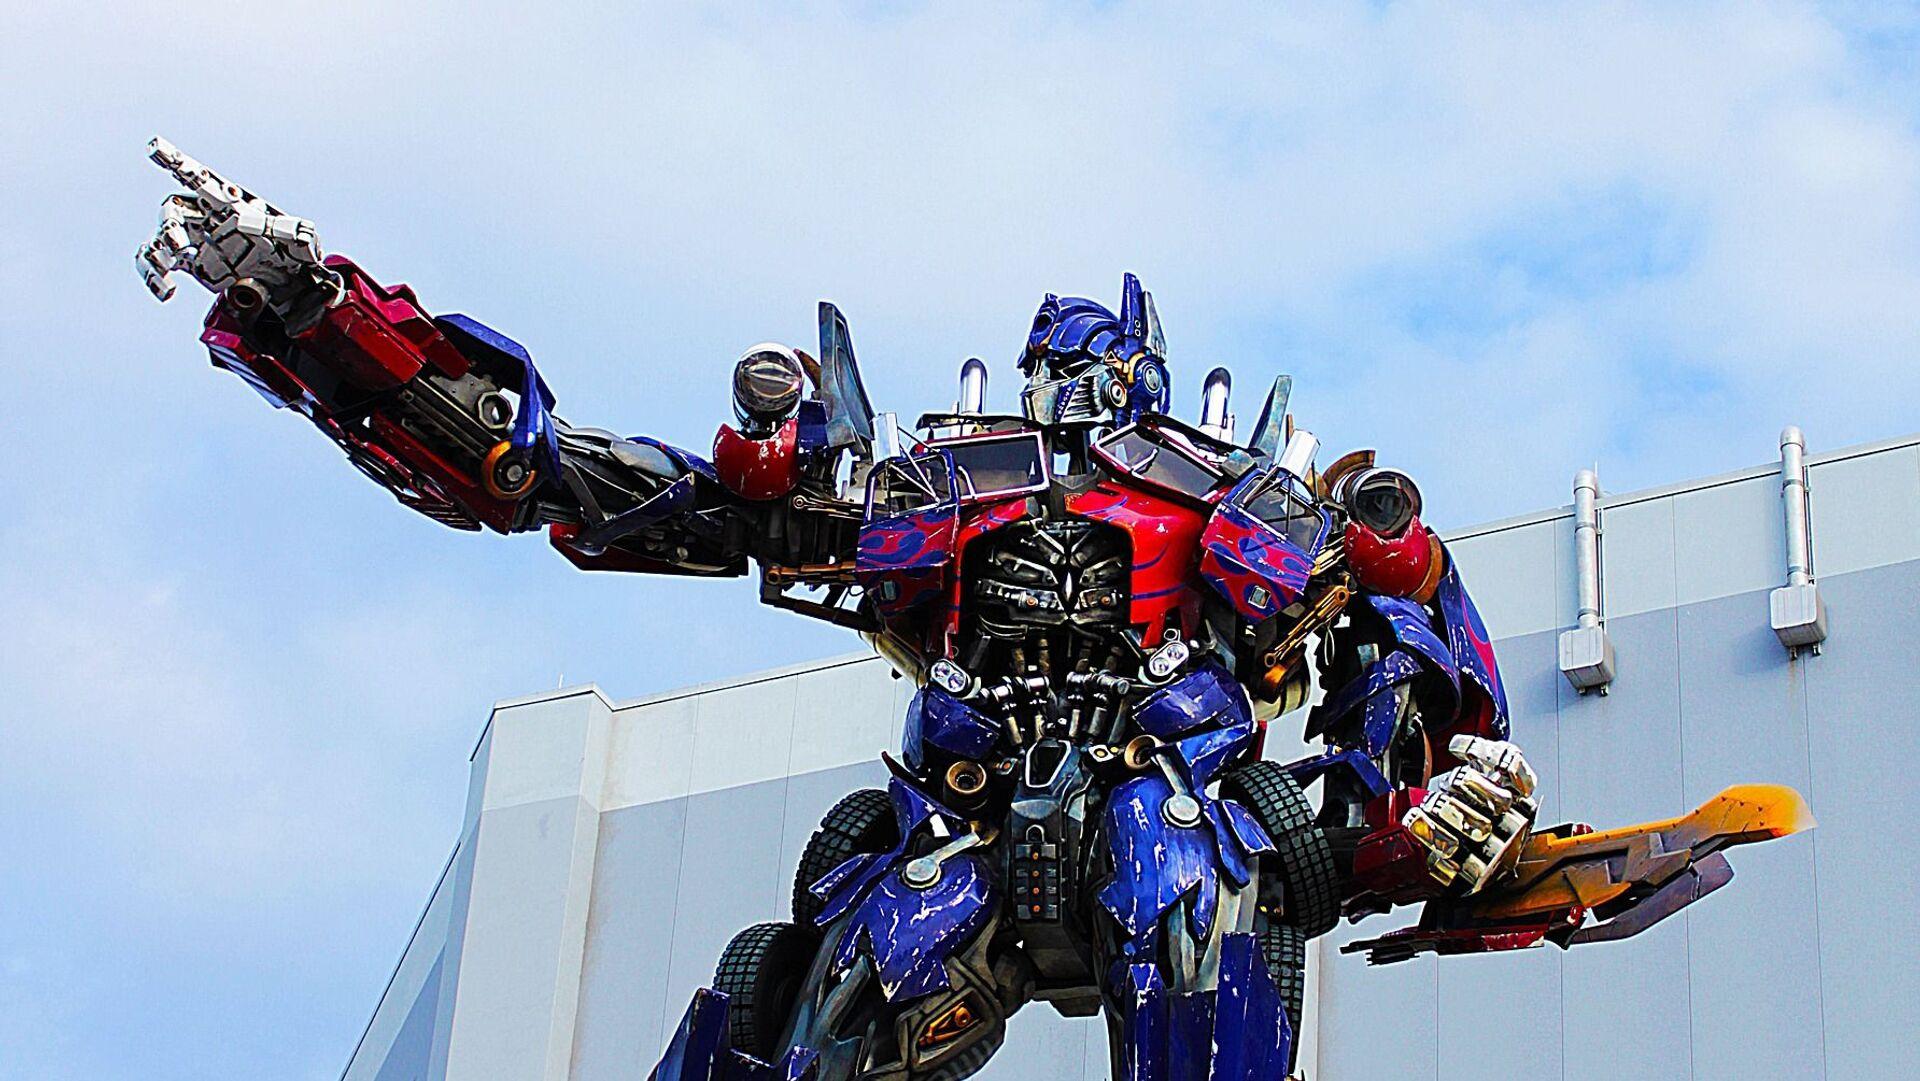 Optimus Prime, el personaje de 'Transformers' - Sputnik Mundo, 1920, 08.09.2021